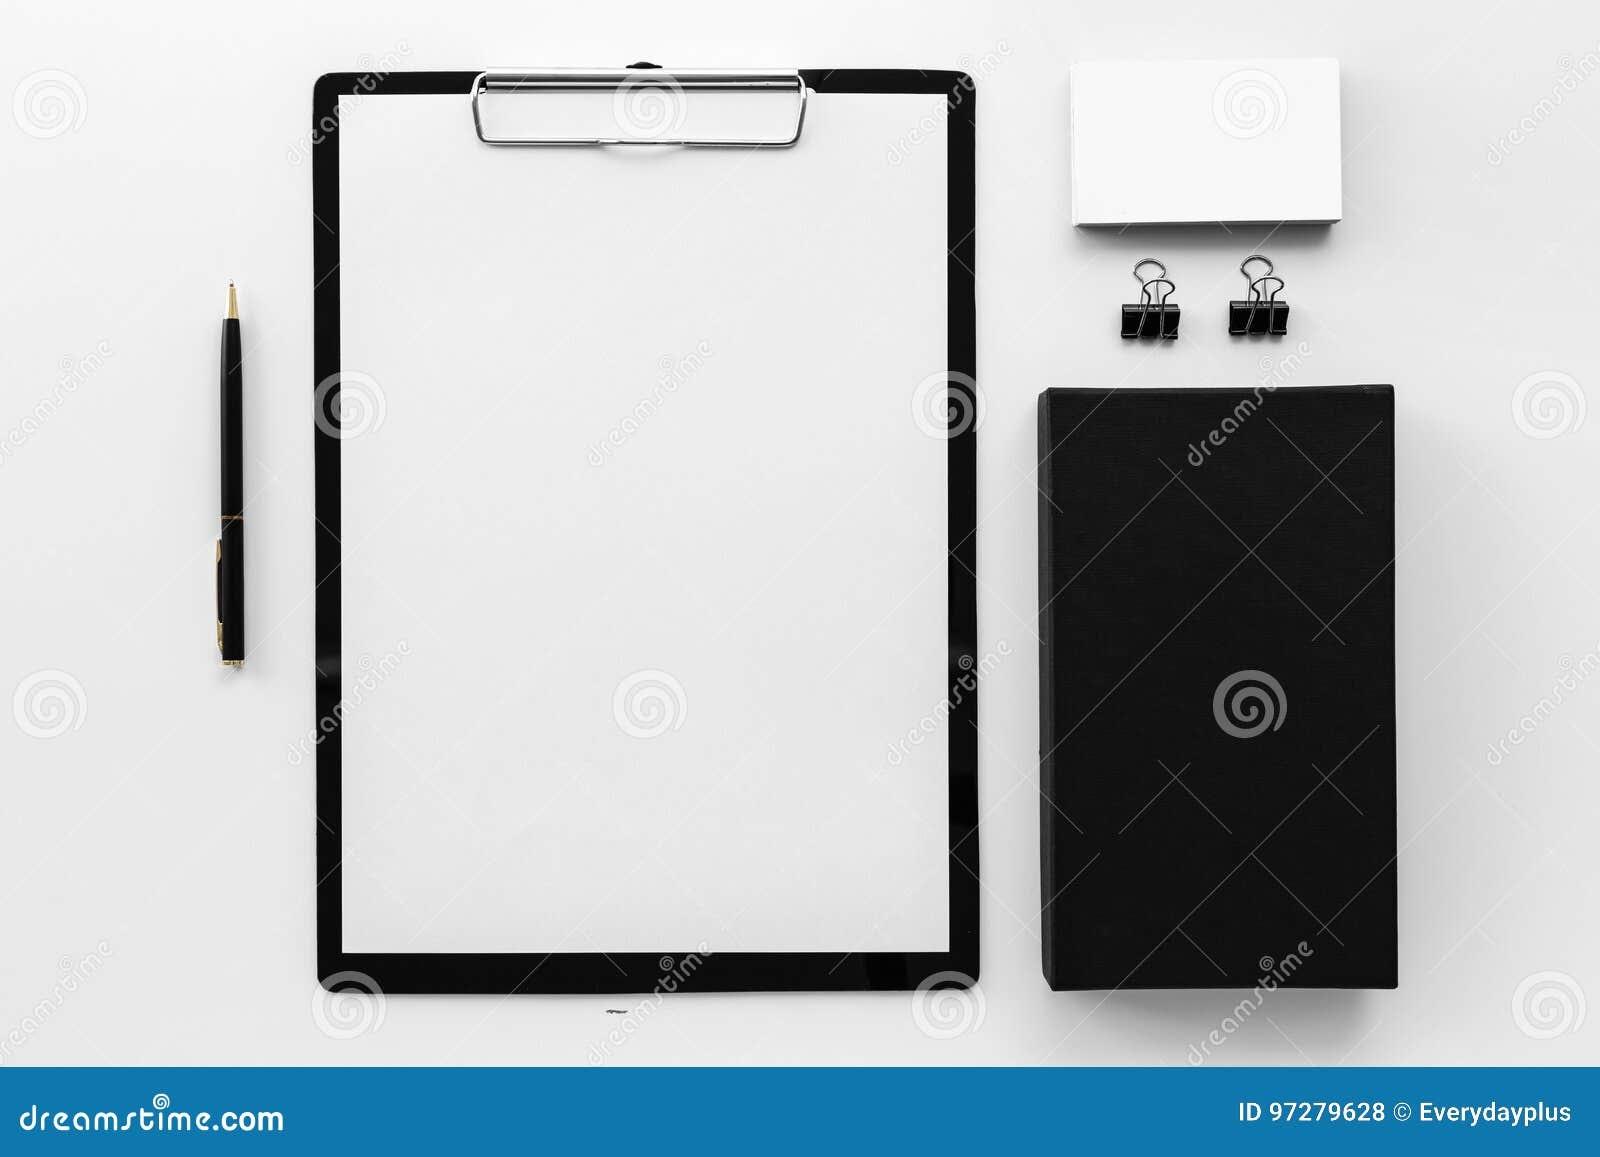 Black Stationery Branding Mockup Free Download Free ...